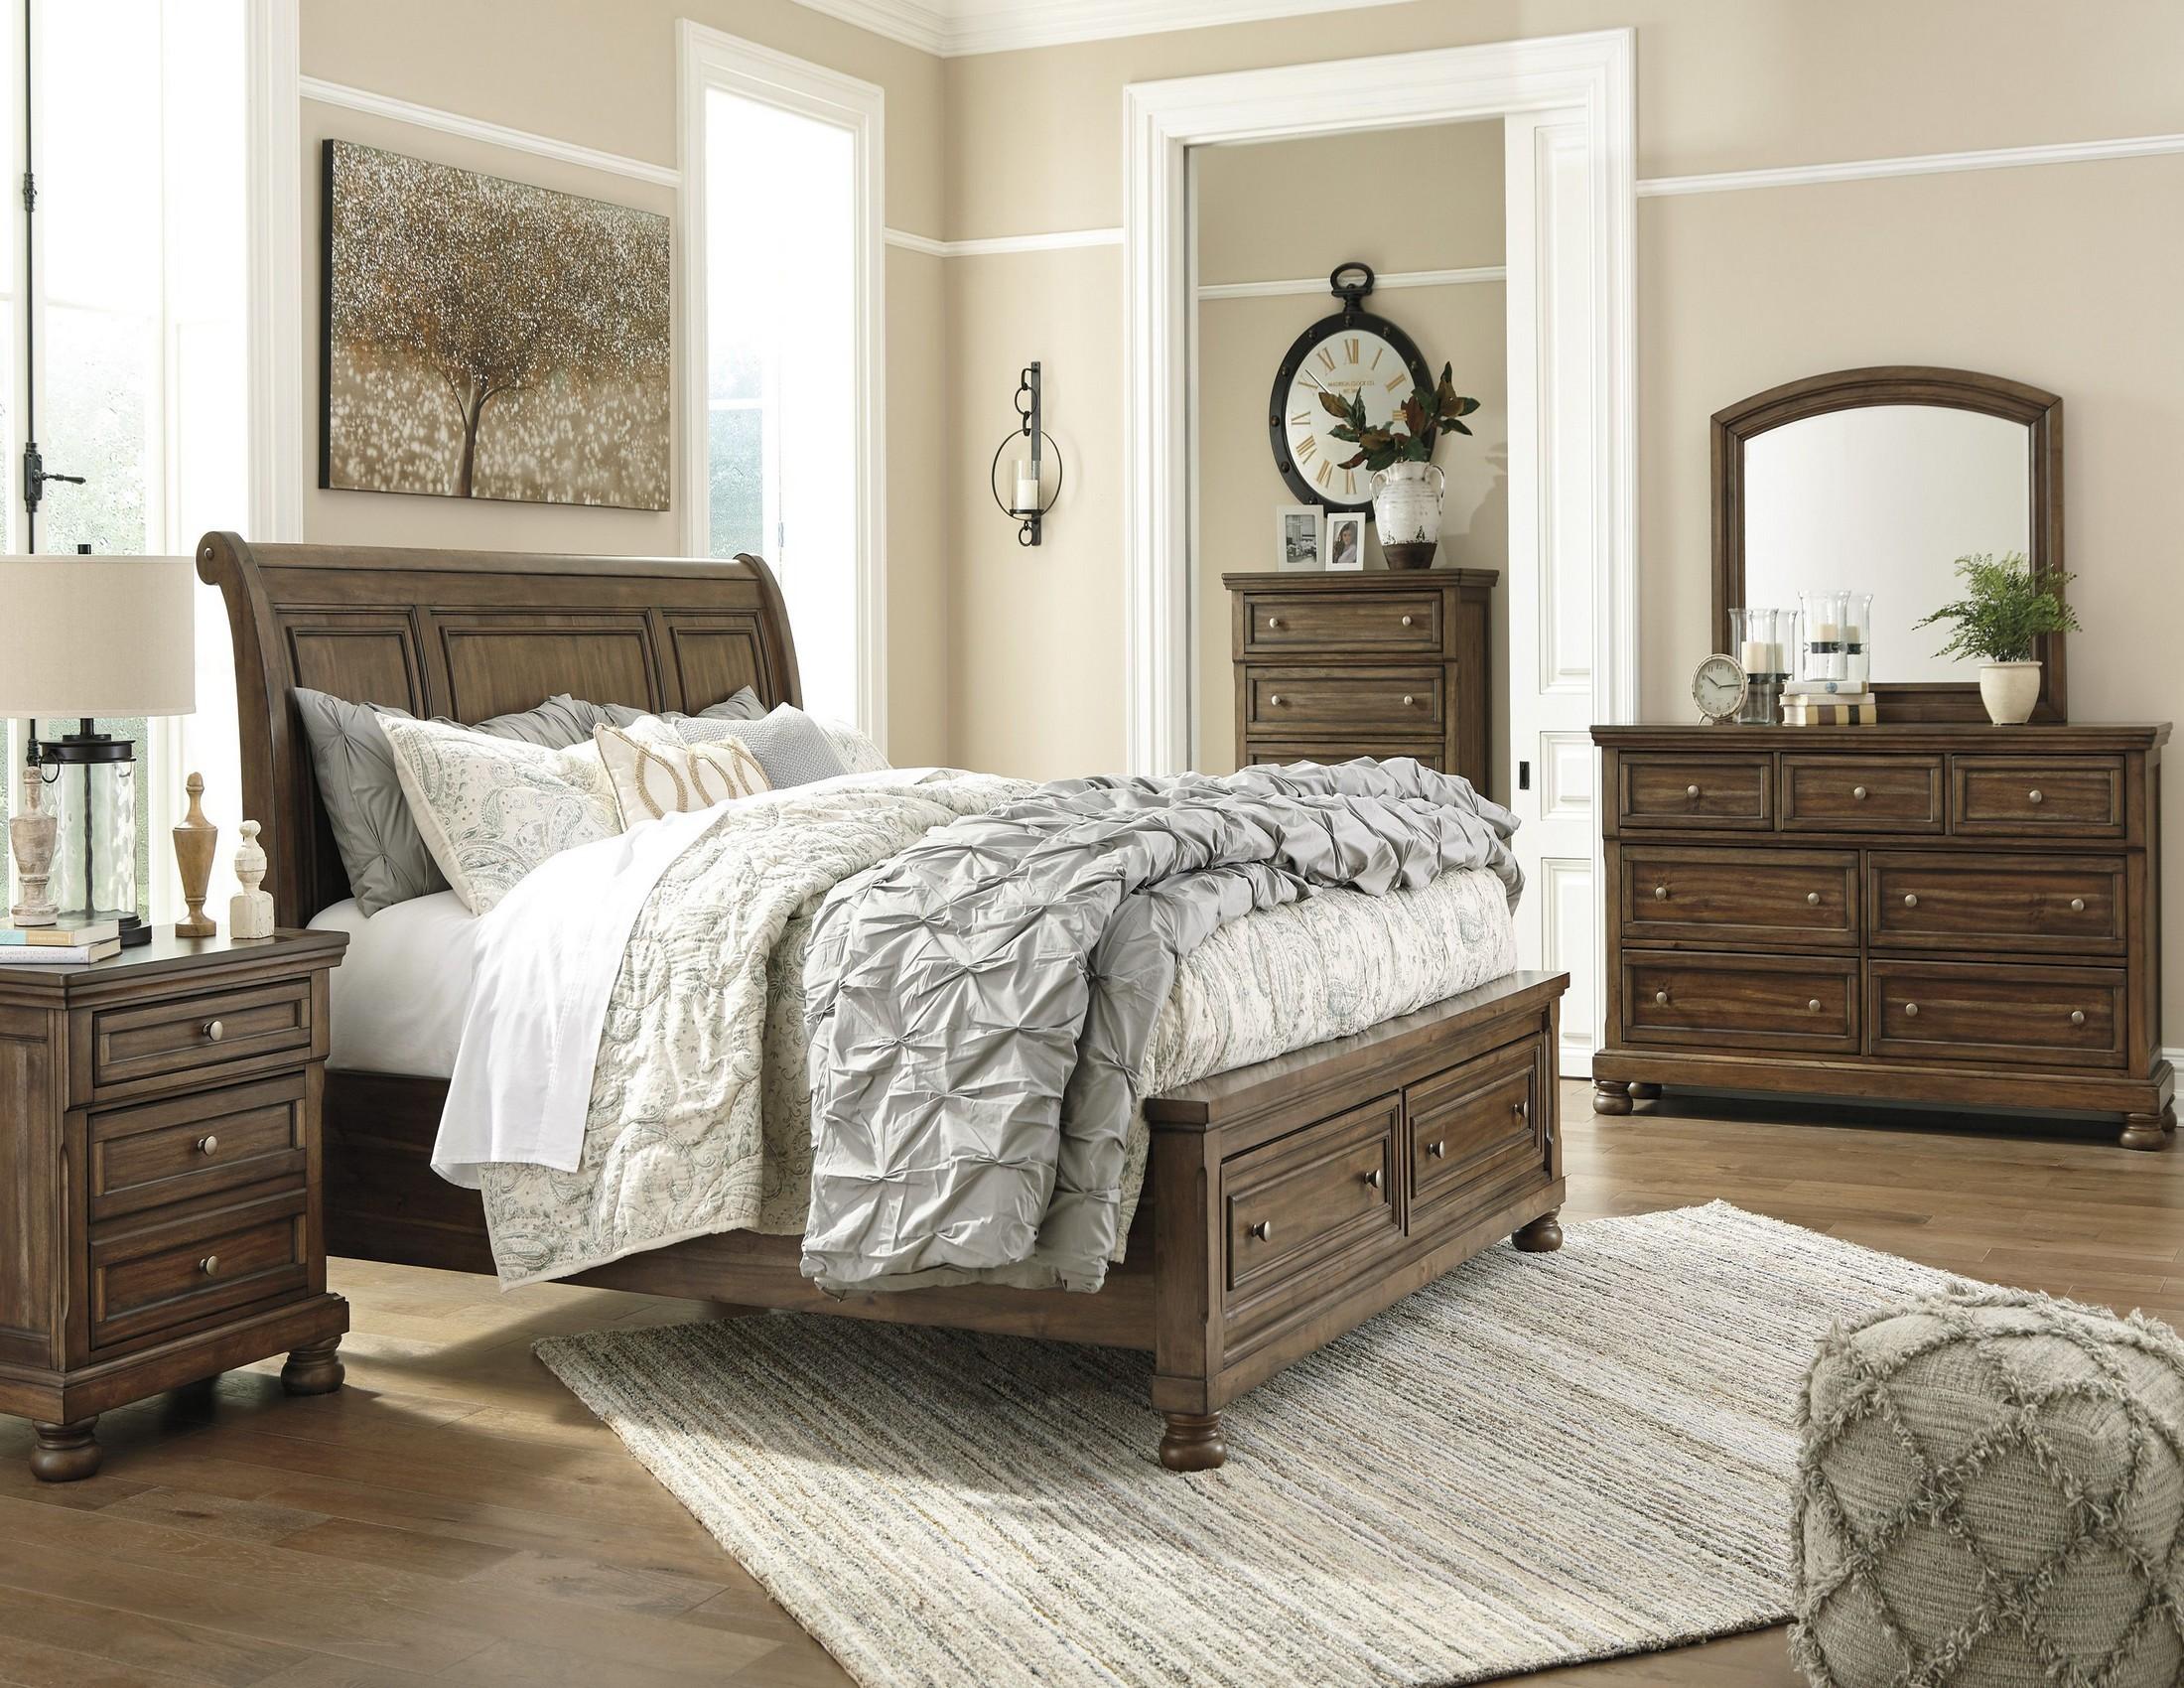 Flynnter Medium Brown Sleigh Storage Bedroom Set 1stopbedrooms